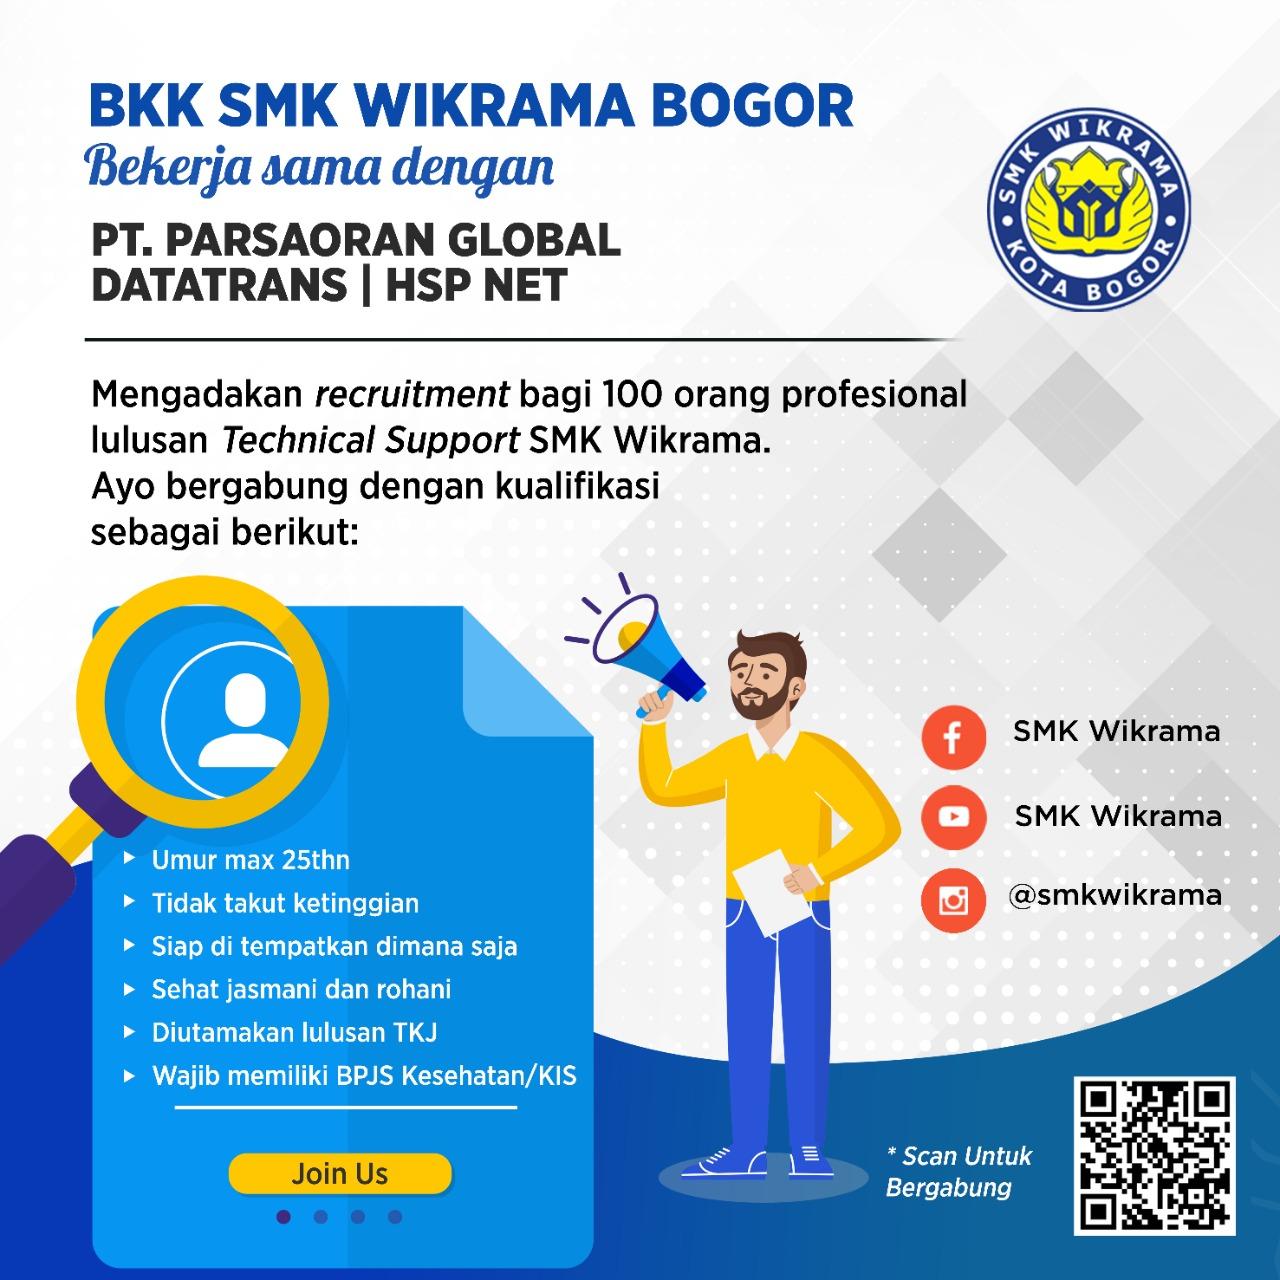 Smk Wikrama Bogor